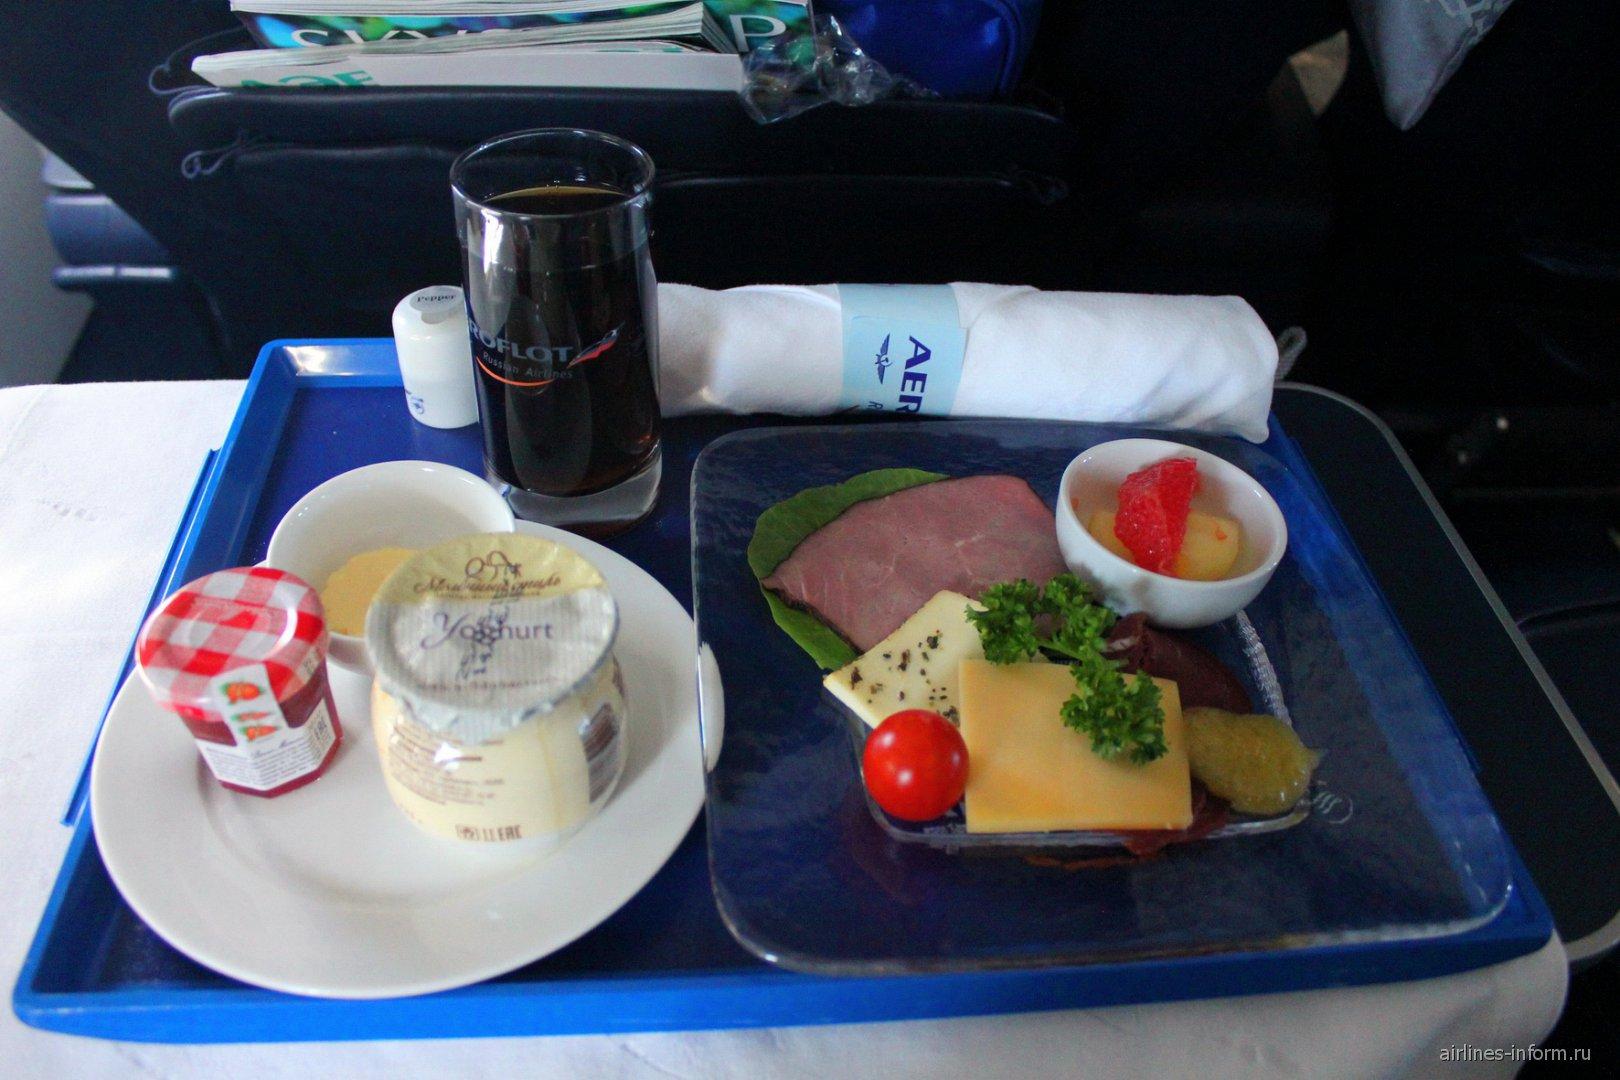 Холодные закуски в бизнес-классе Аэрофлота на рейсе Москва-Тиват